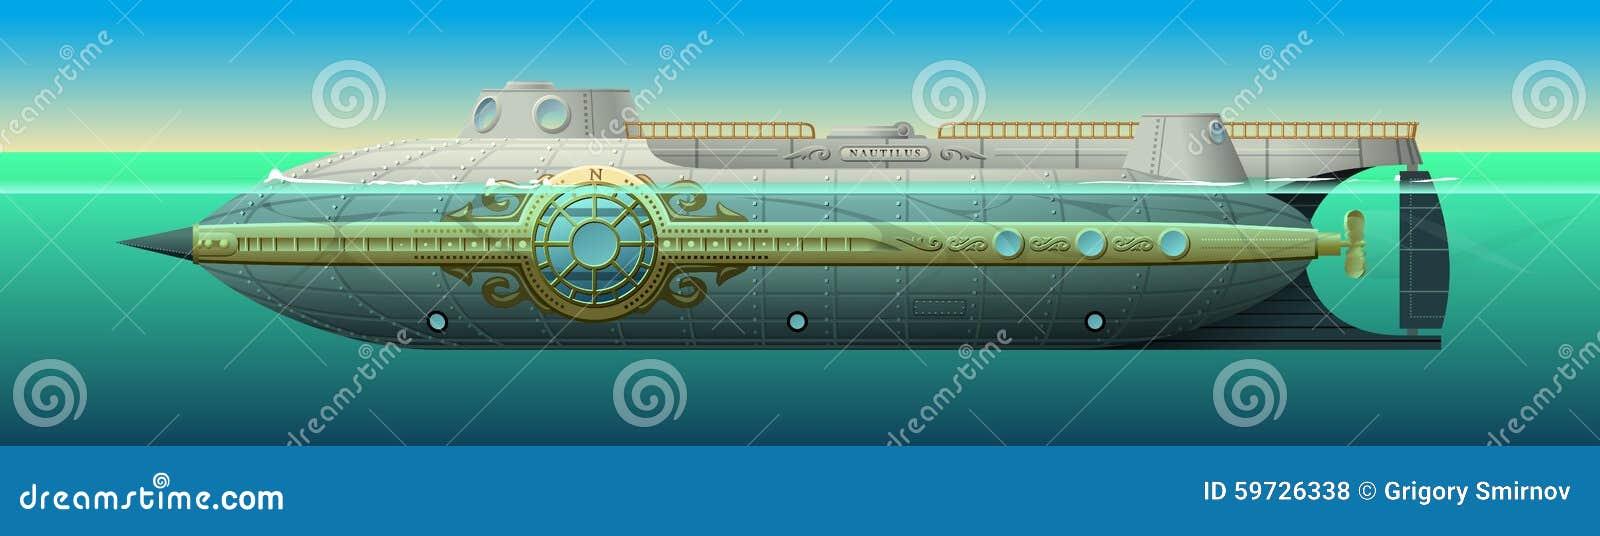 nautilus submarine of captain nemo stock illustration stats clip art state clipart images